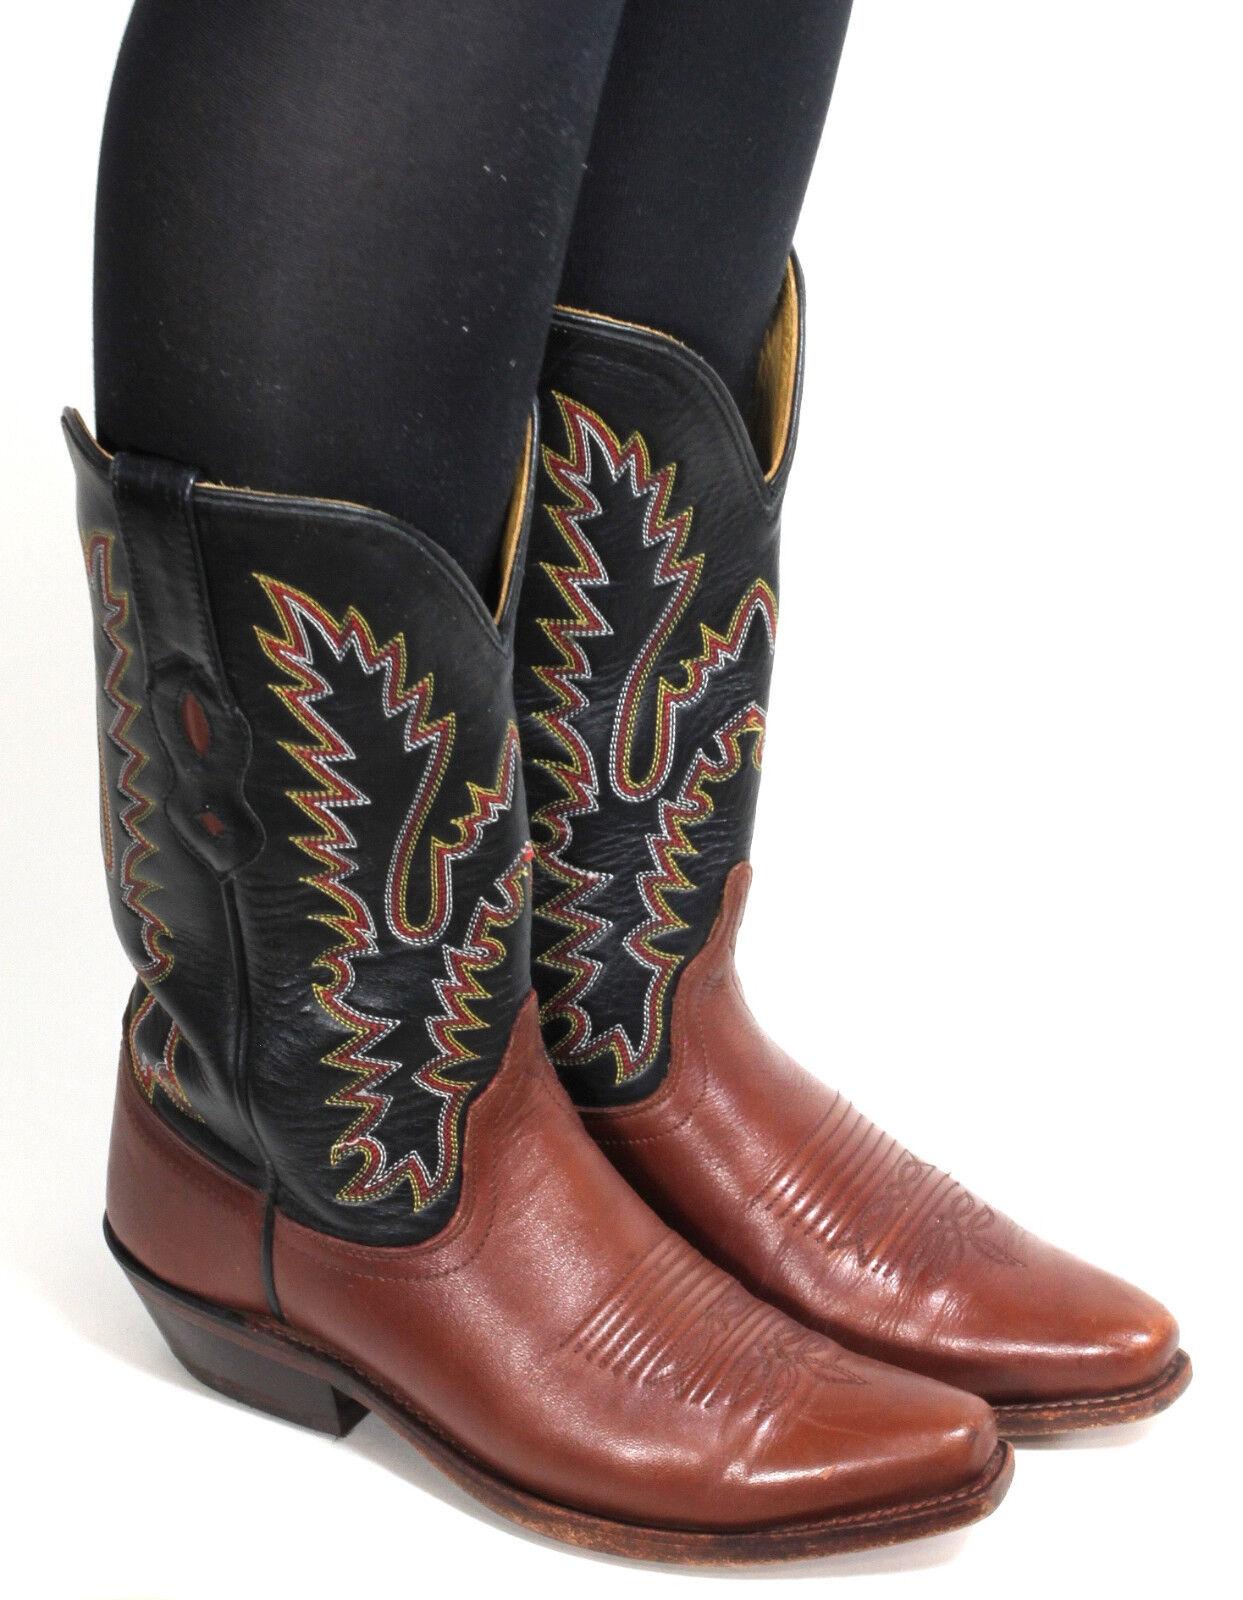 Westernstiefel Cowboystiefel Catalan Style Line Dance Texas Boots 37,5